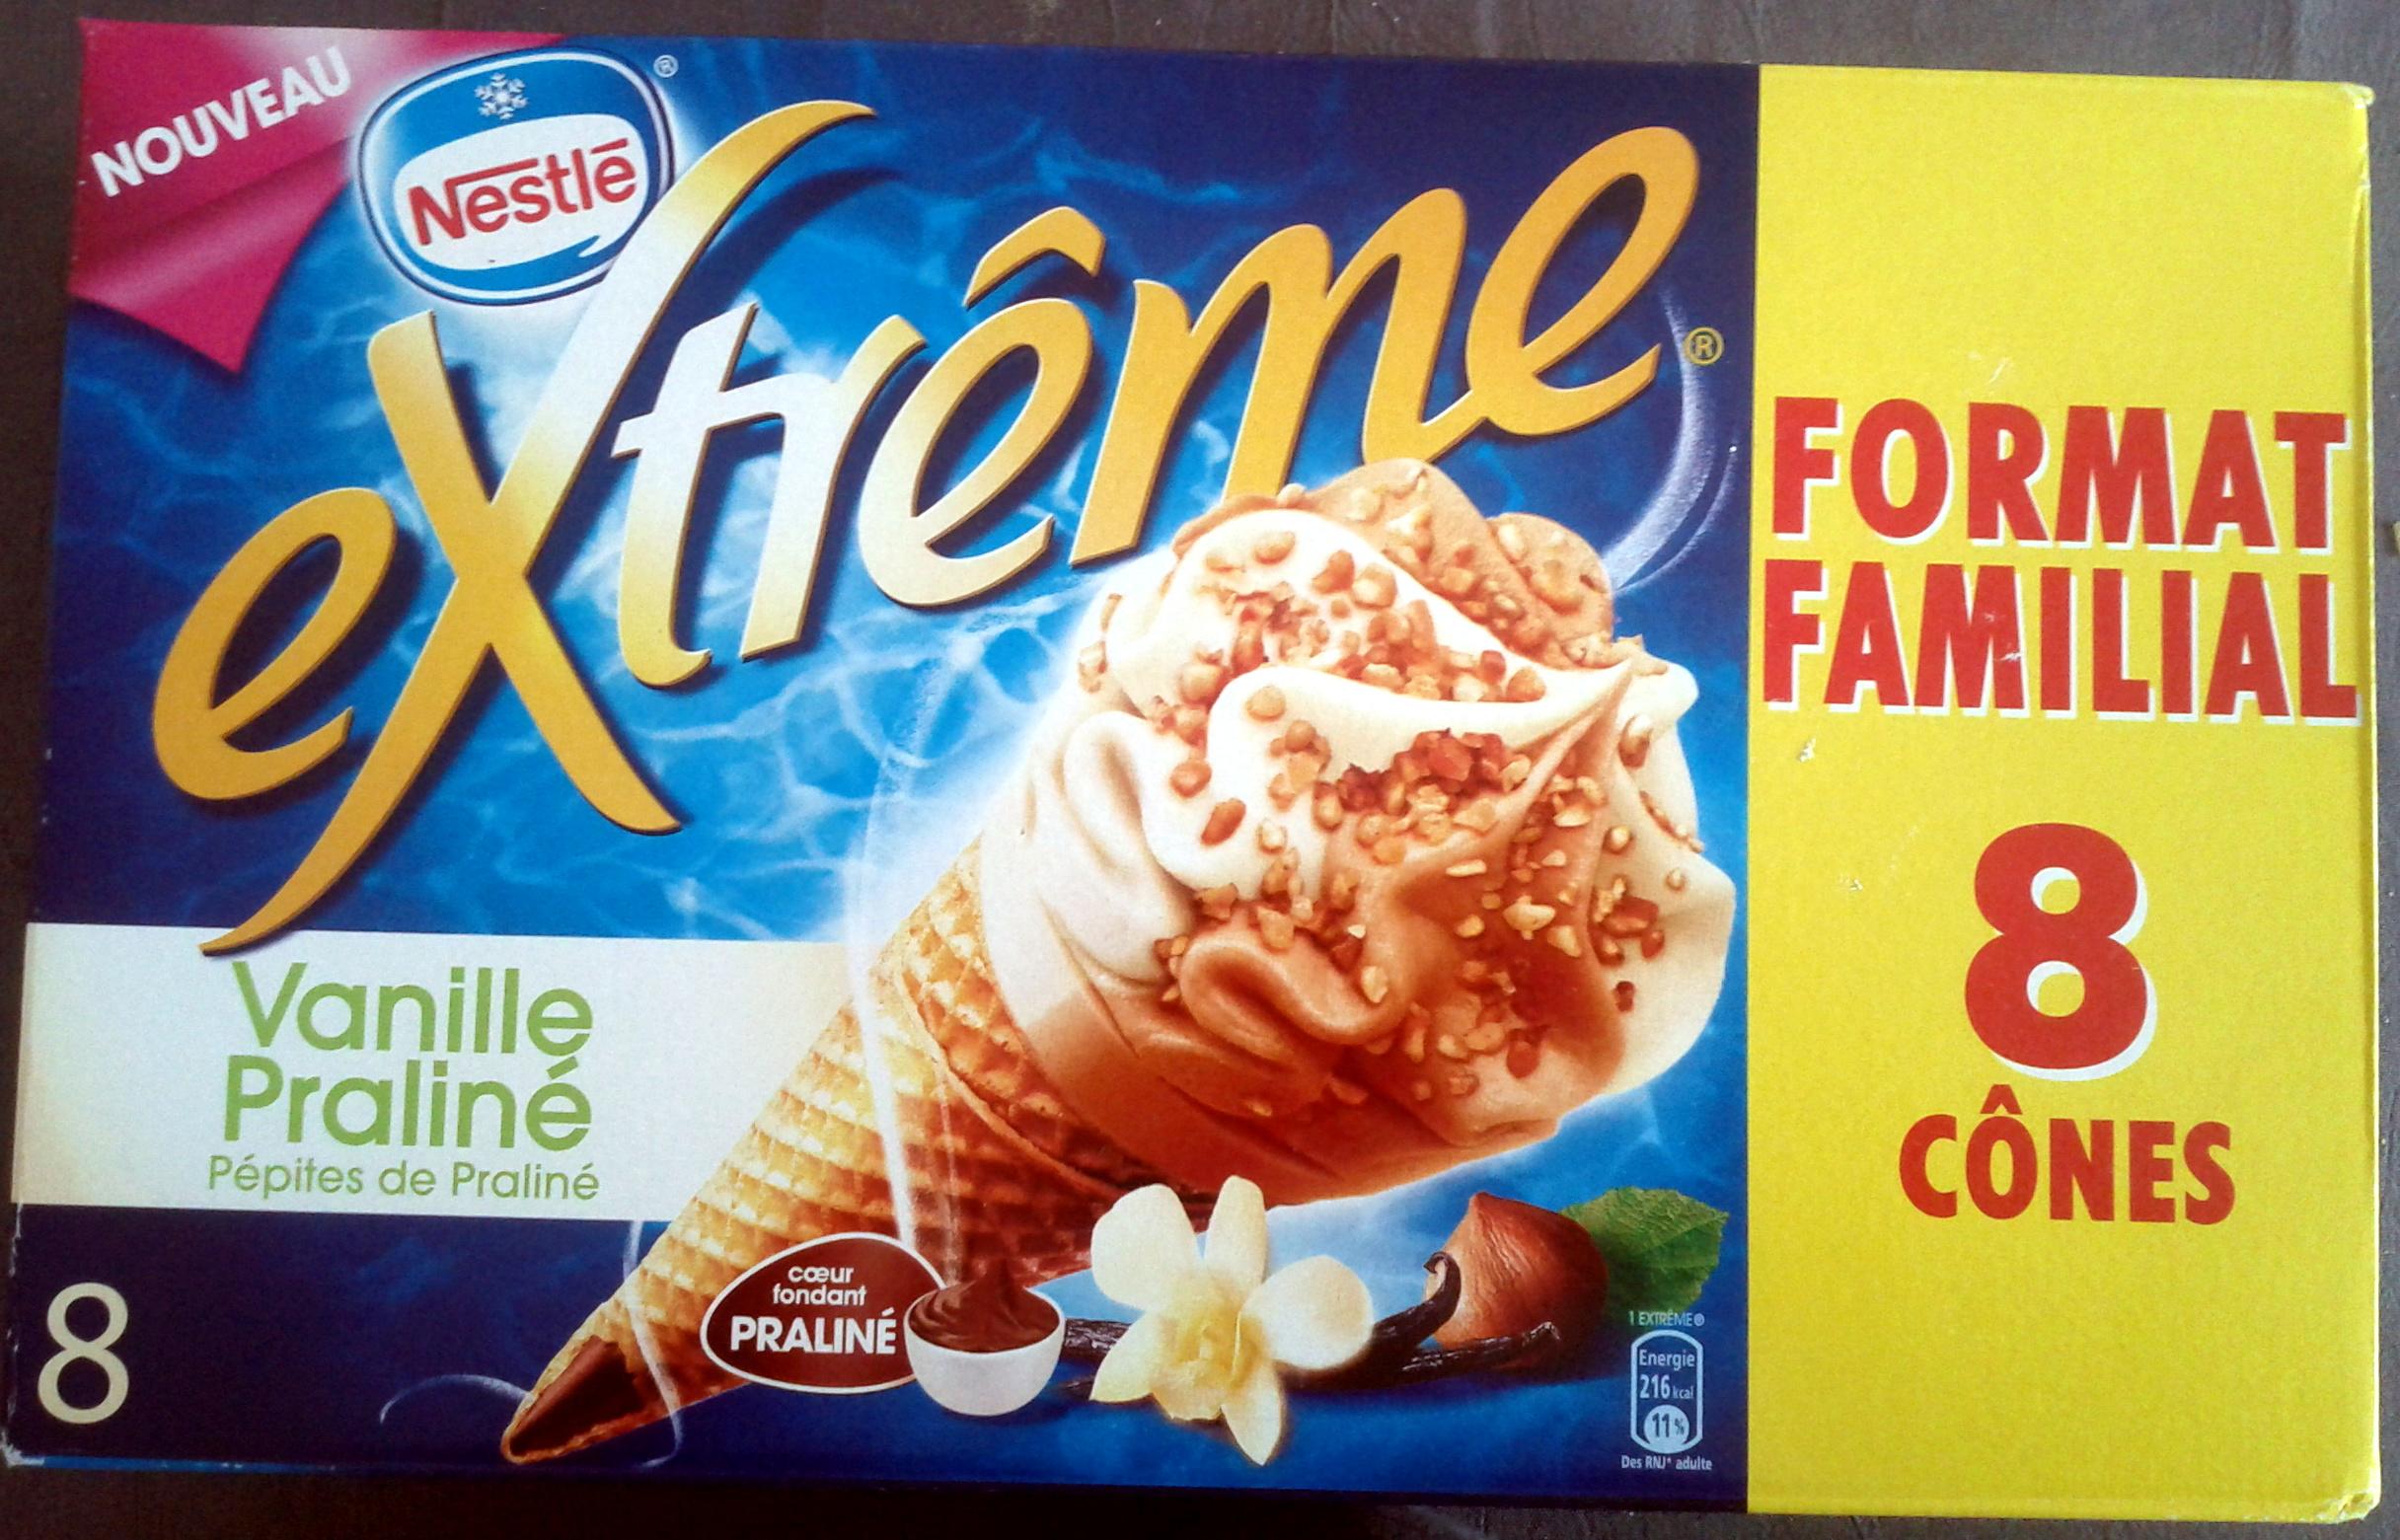 Extrême vanille praliné - Produit - fr